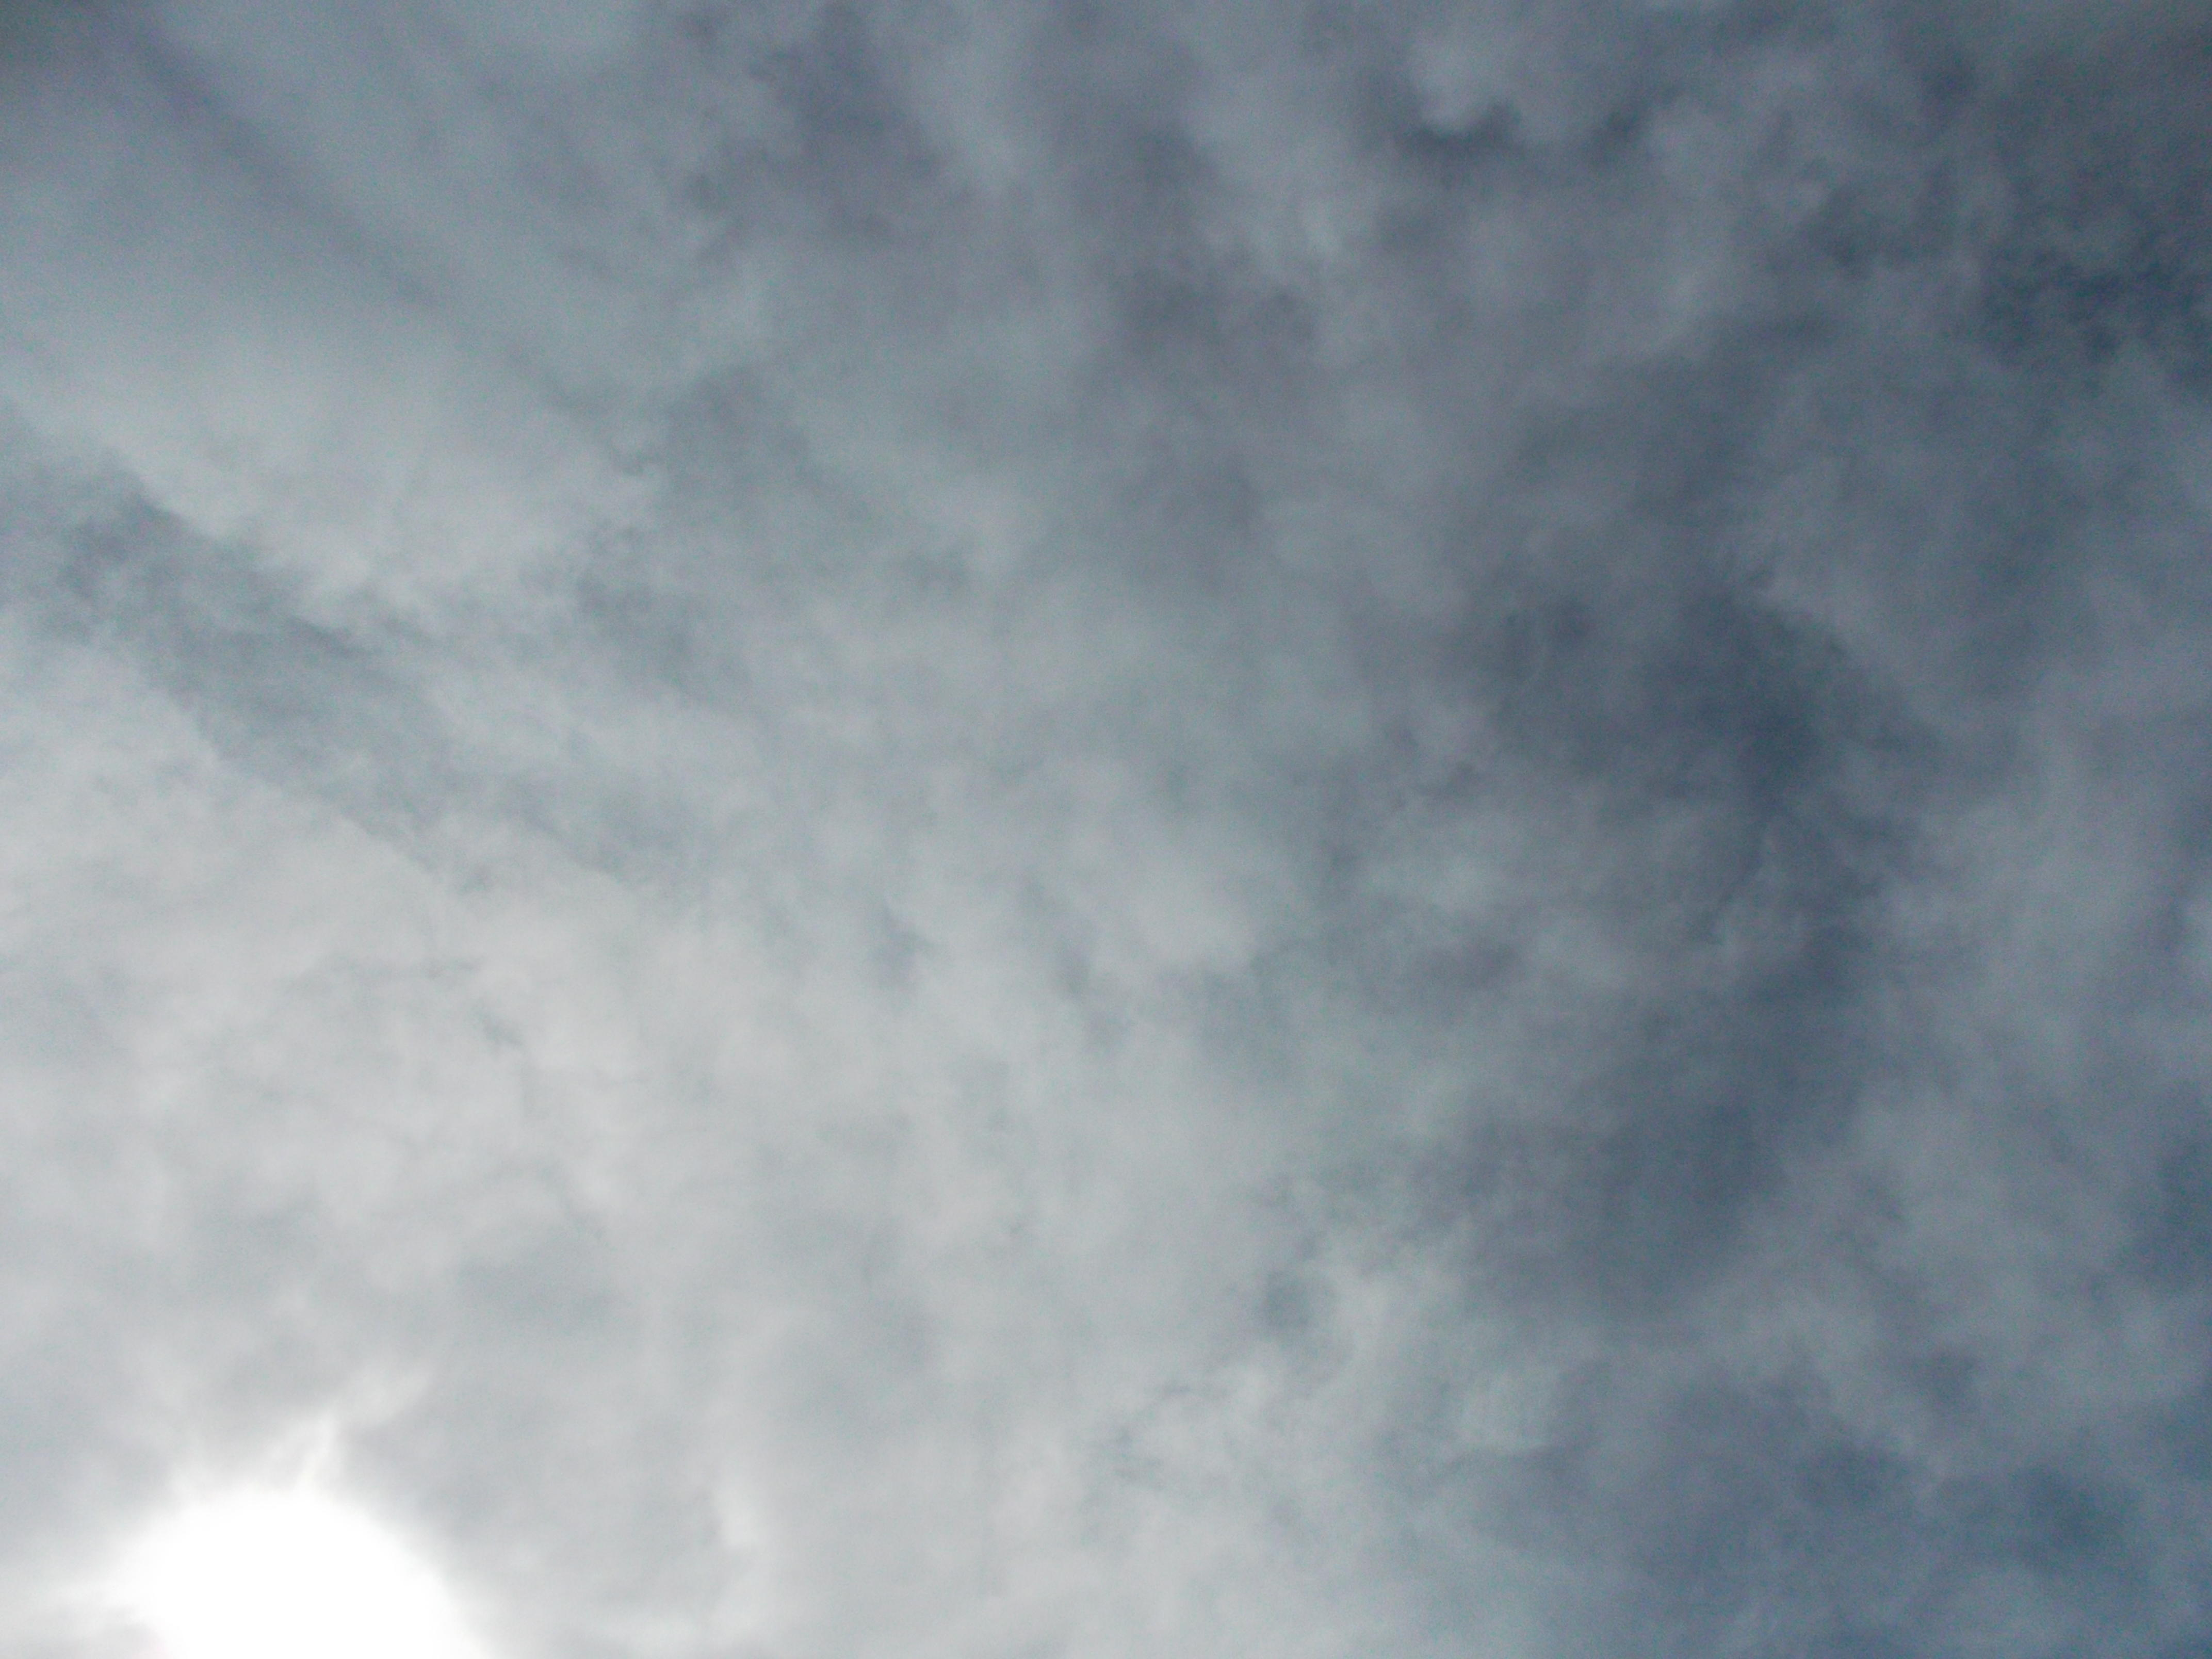 2013-04-17 Longitude -0.371 Latitude 49.182 Altitude 29 Heure 15h39